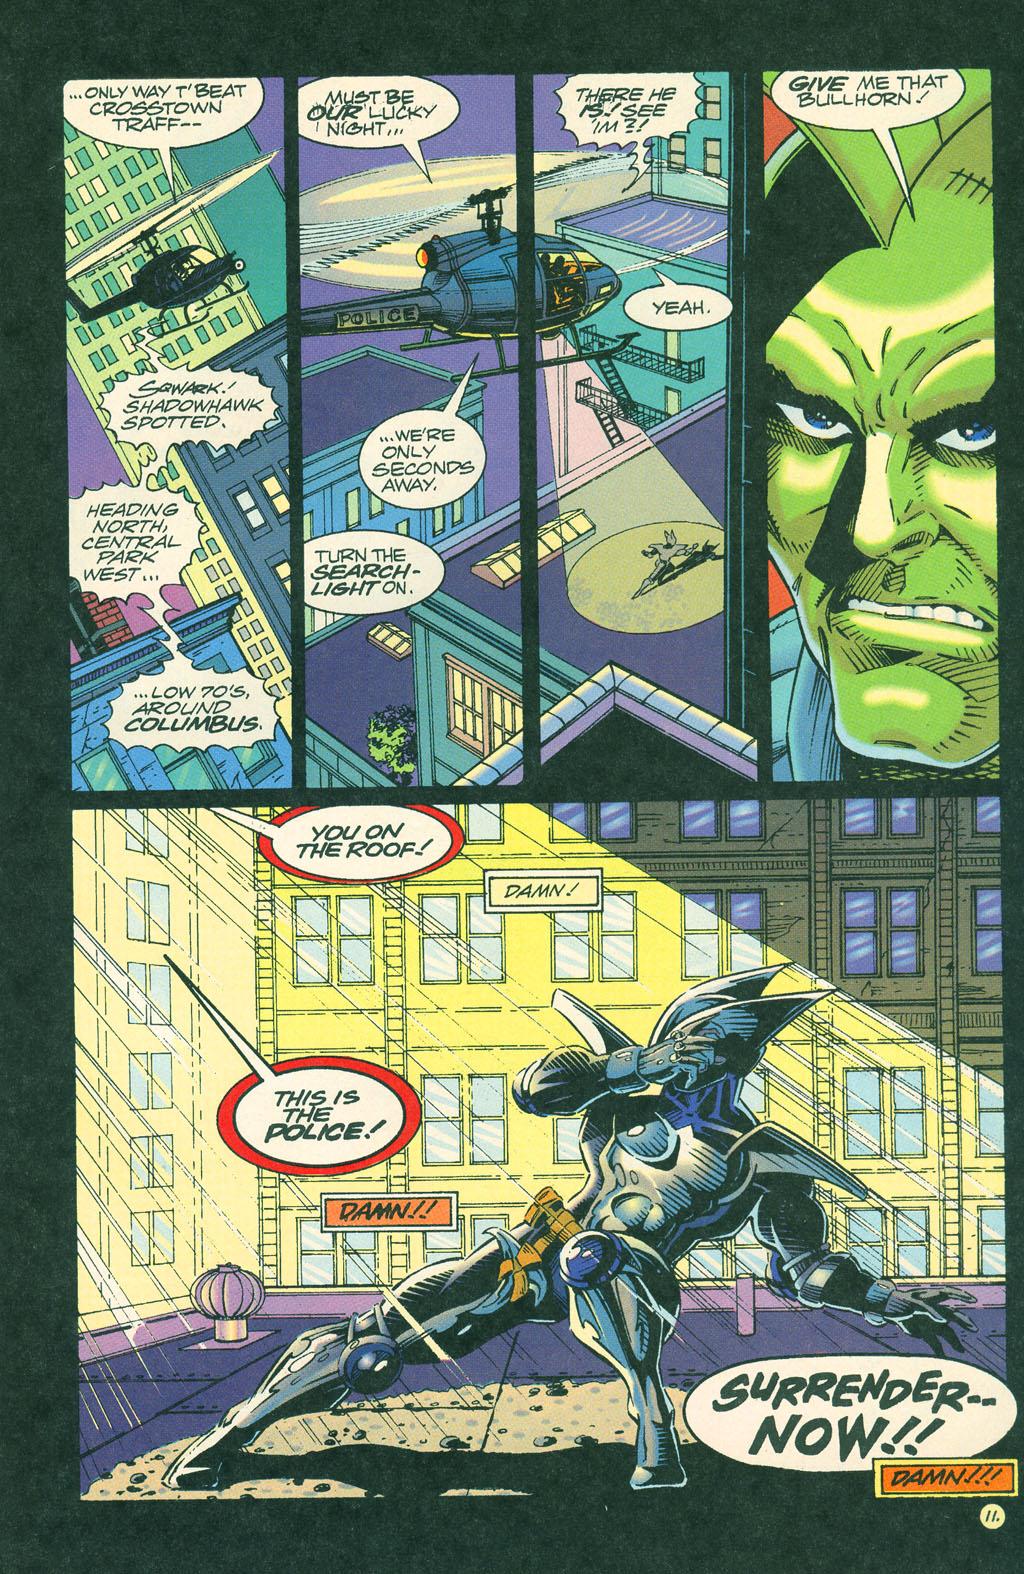 Read online ShadowHawk comic -  Issue #4 - 14